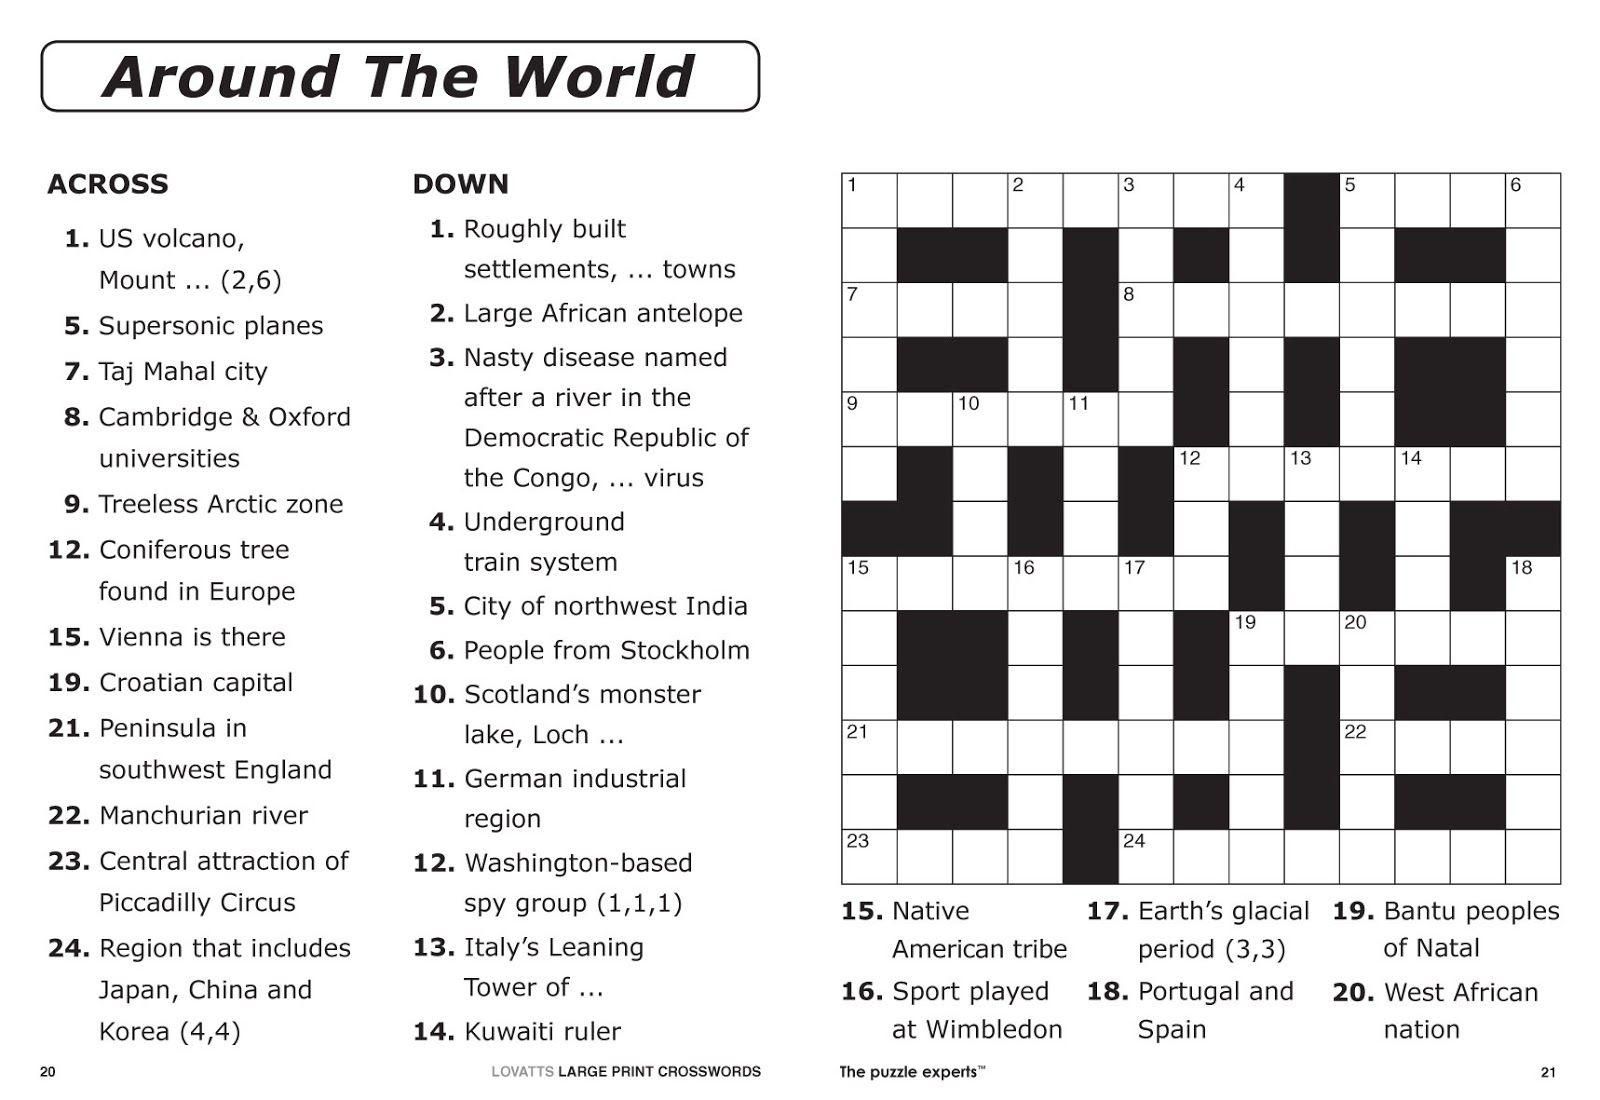 Free Printable Large Print Crossword Puzzles   M3U8 - Printable Crossword Letters